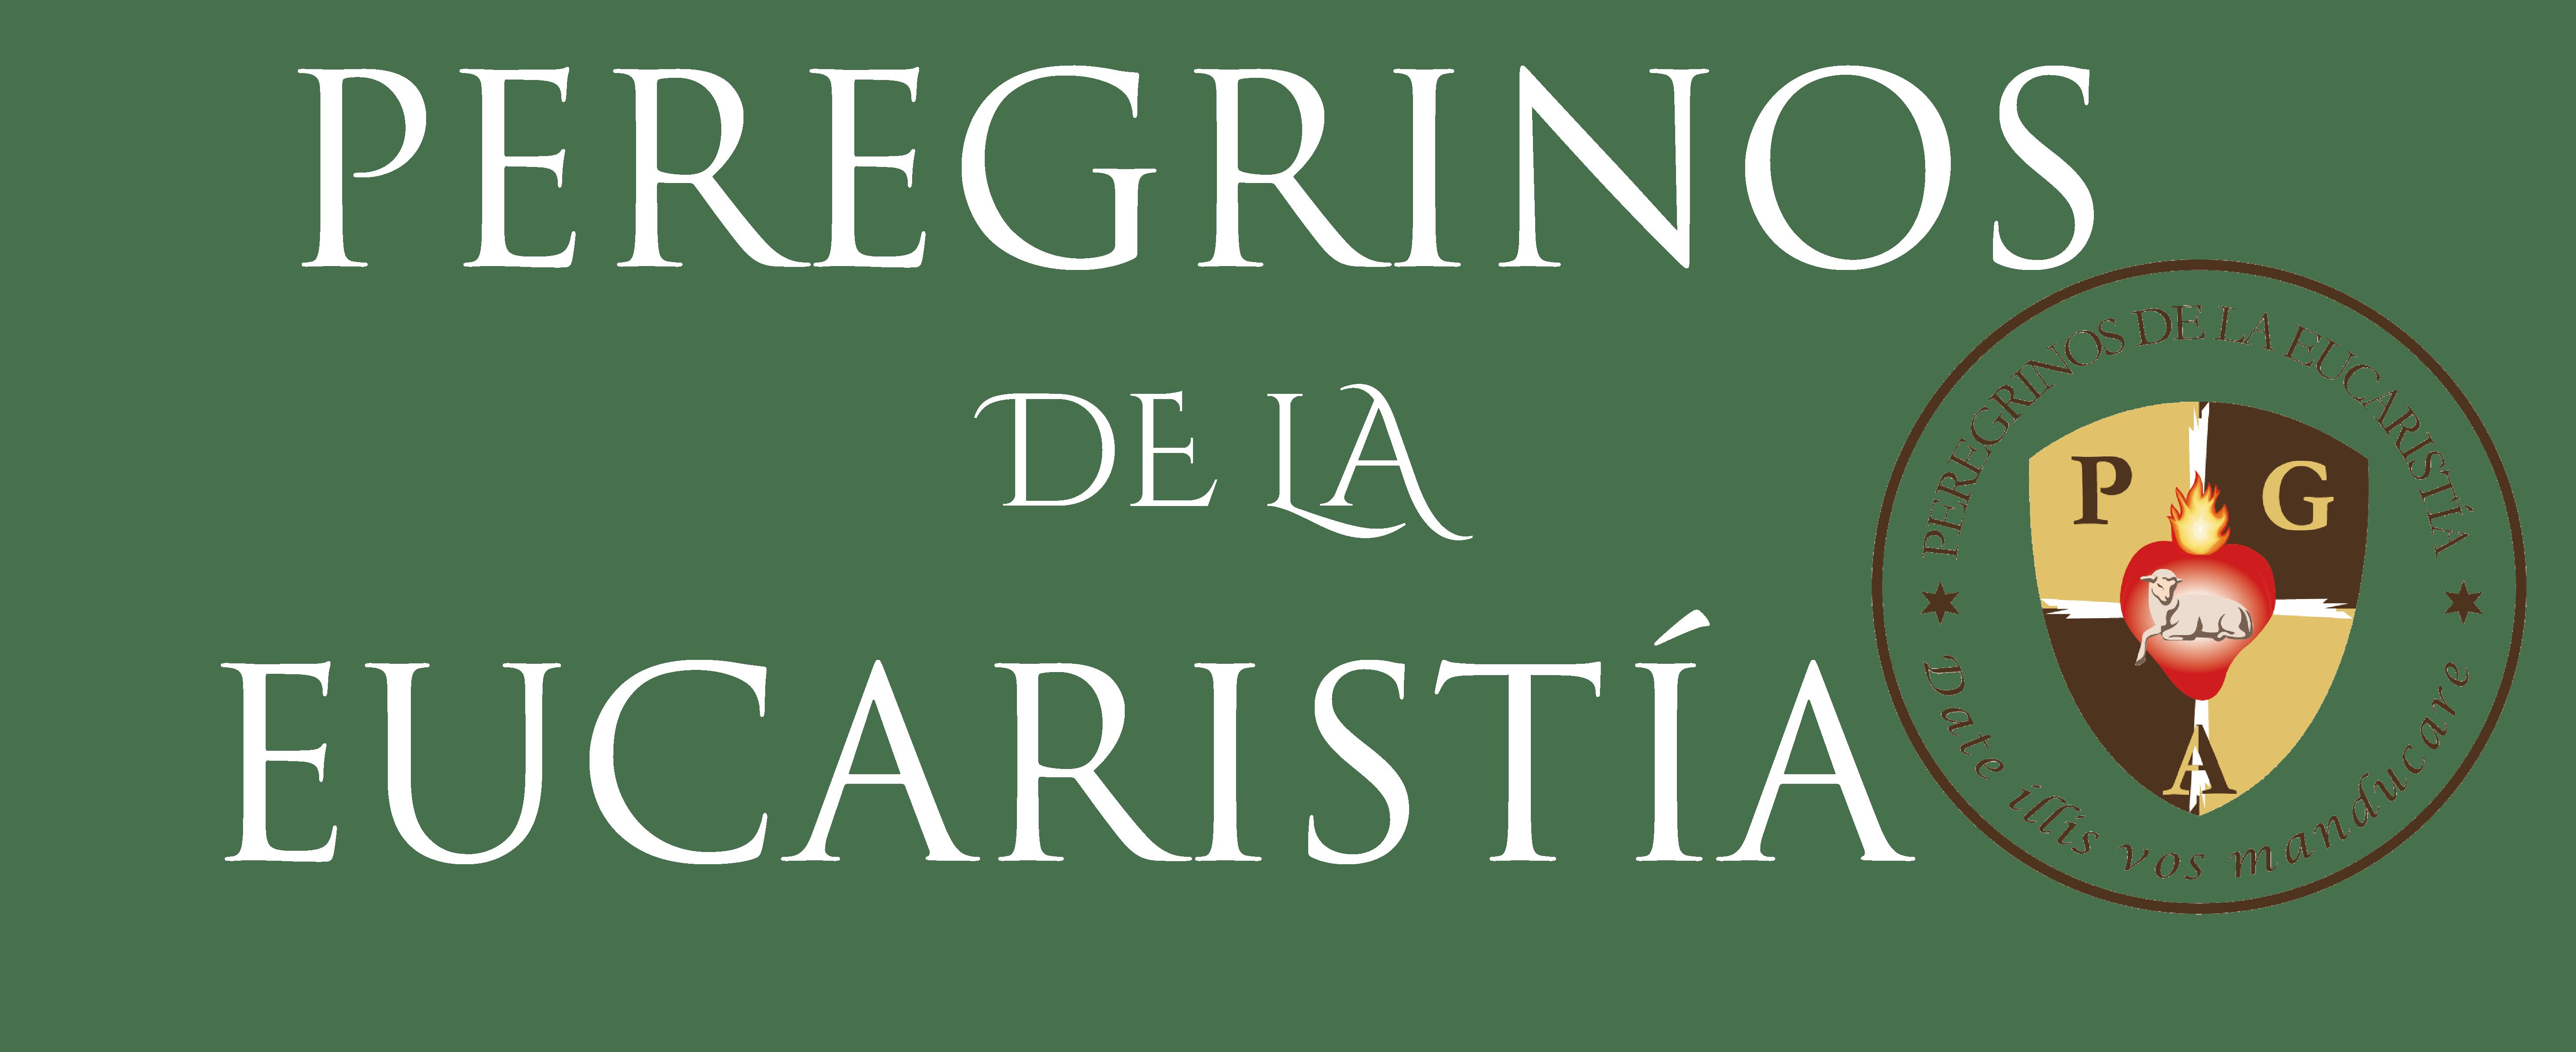 Peregrinos de la Eucaristia